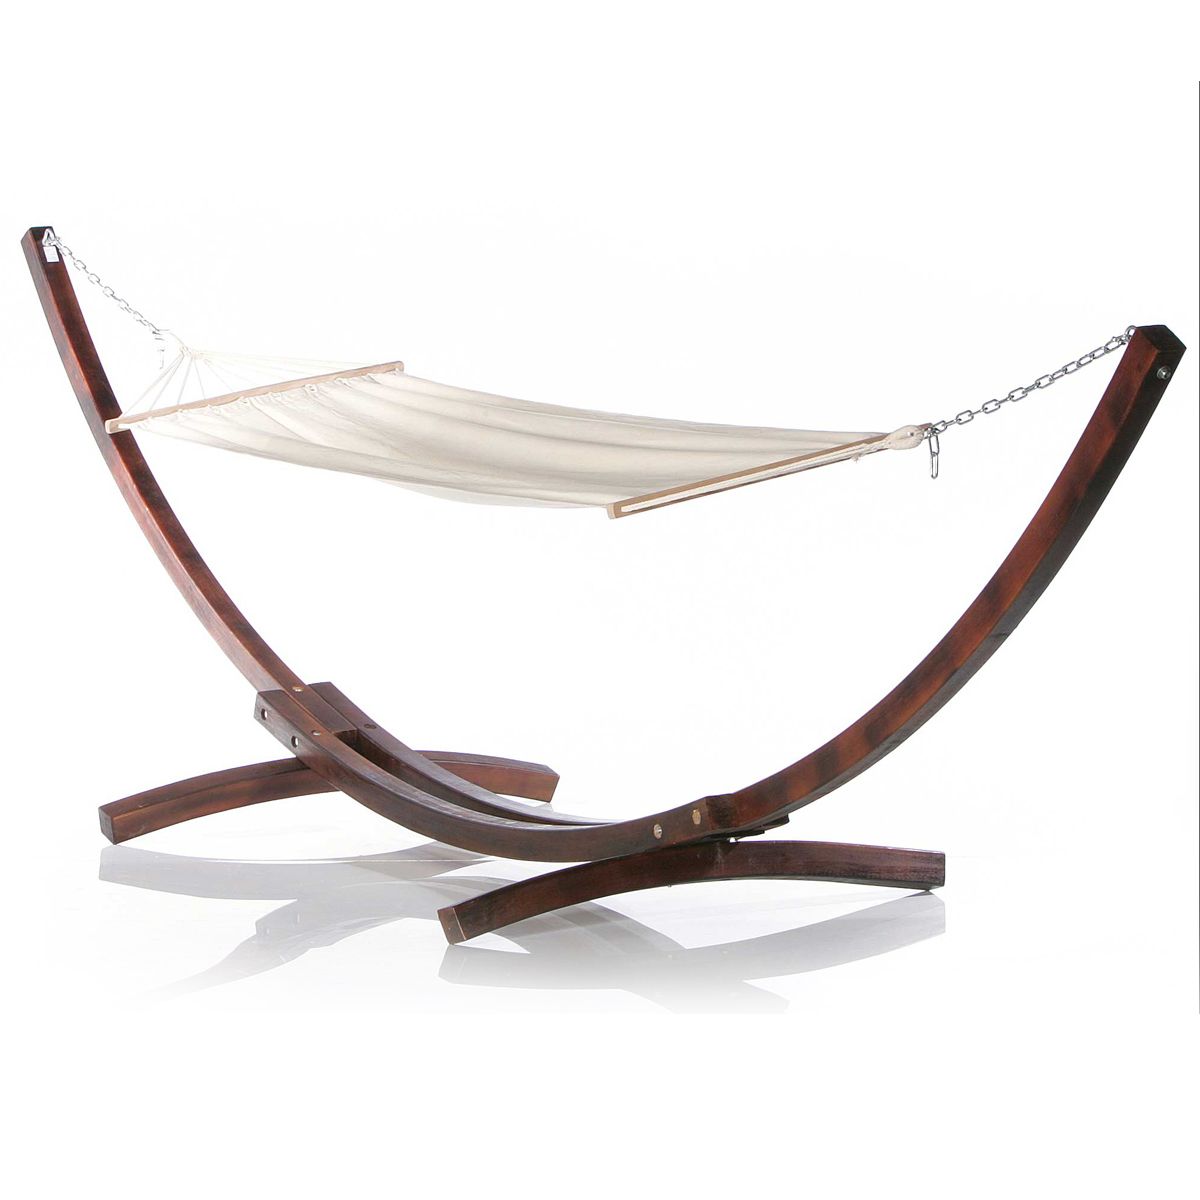 exklusive xxl h ngematte mit holzgestell hollywoodschaukel. Black Bedroom Furniture Sets. Home Design Ideas